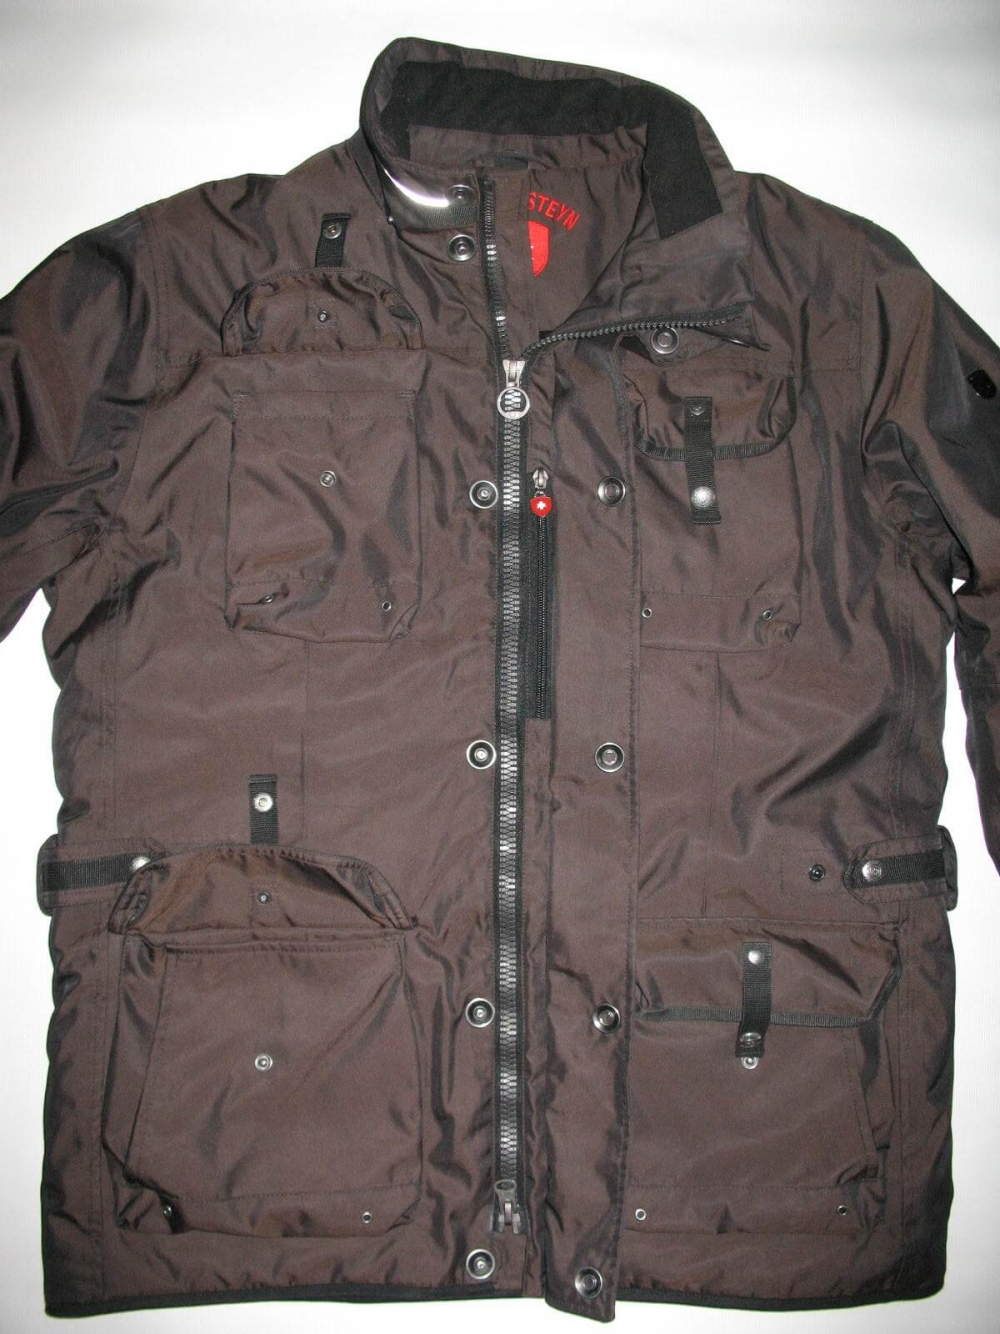 Куртка WELLENSTEYN Leuchtfeuer jacket (размер XL) - 9